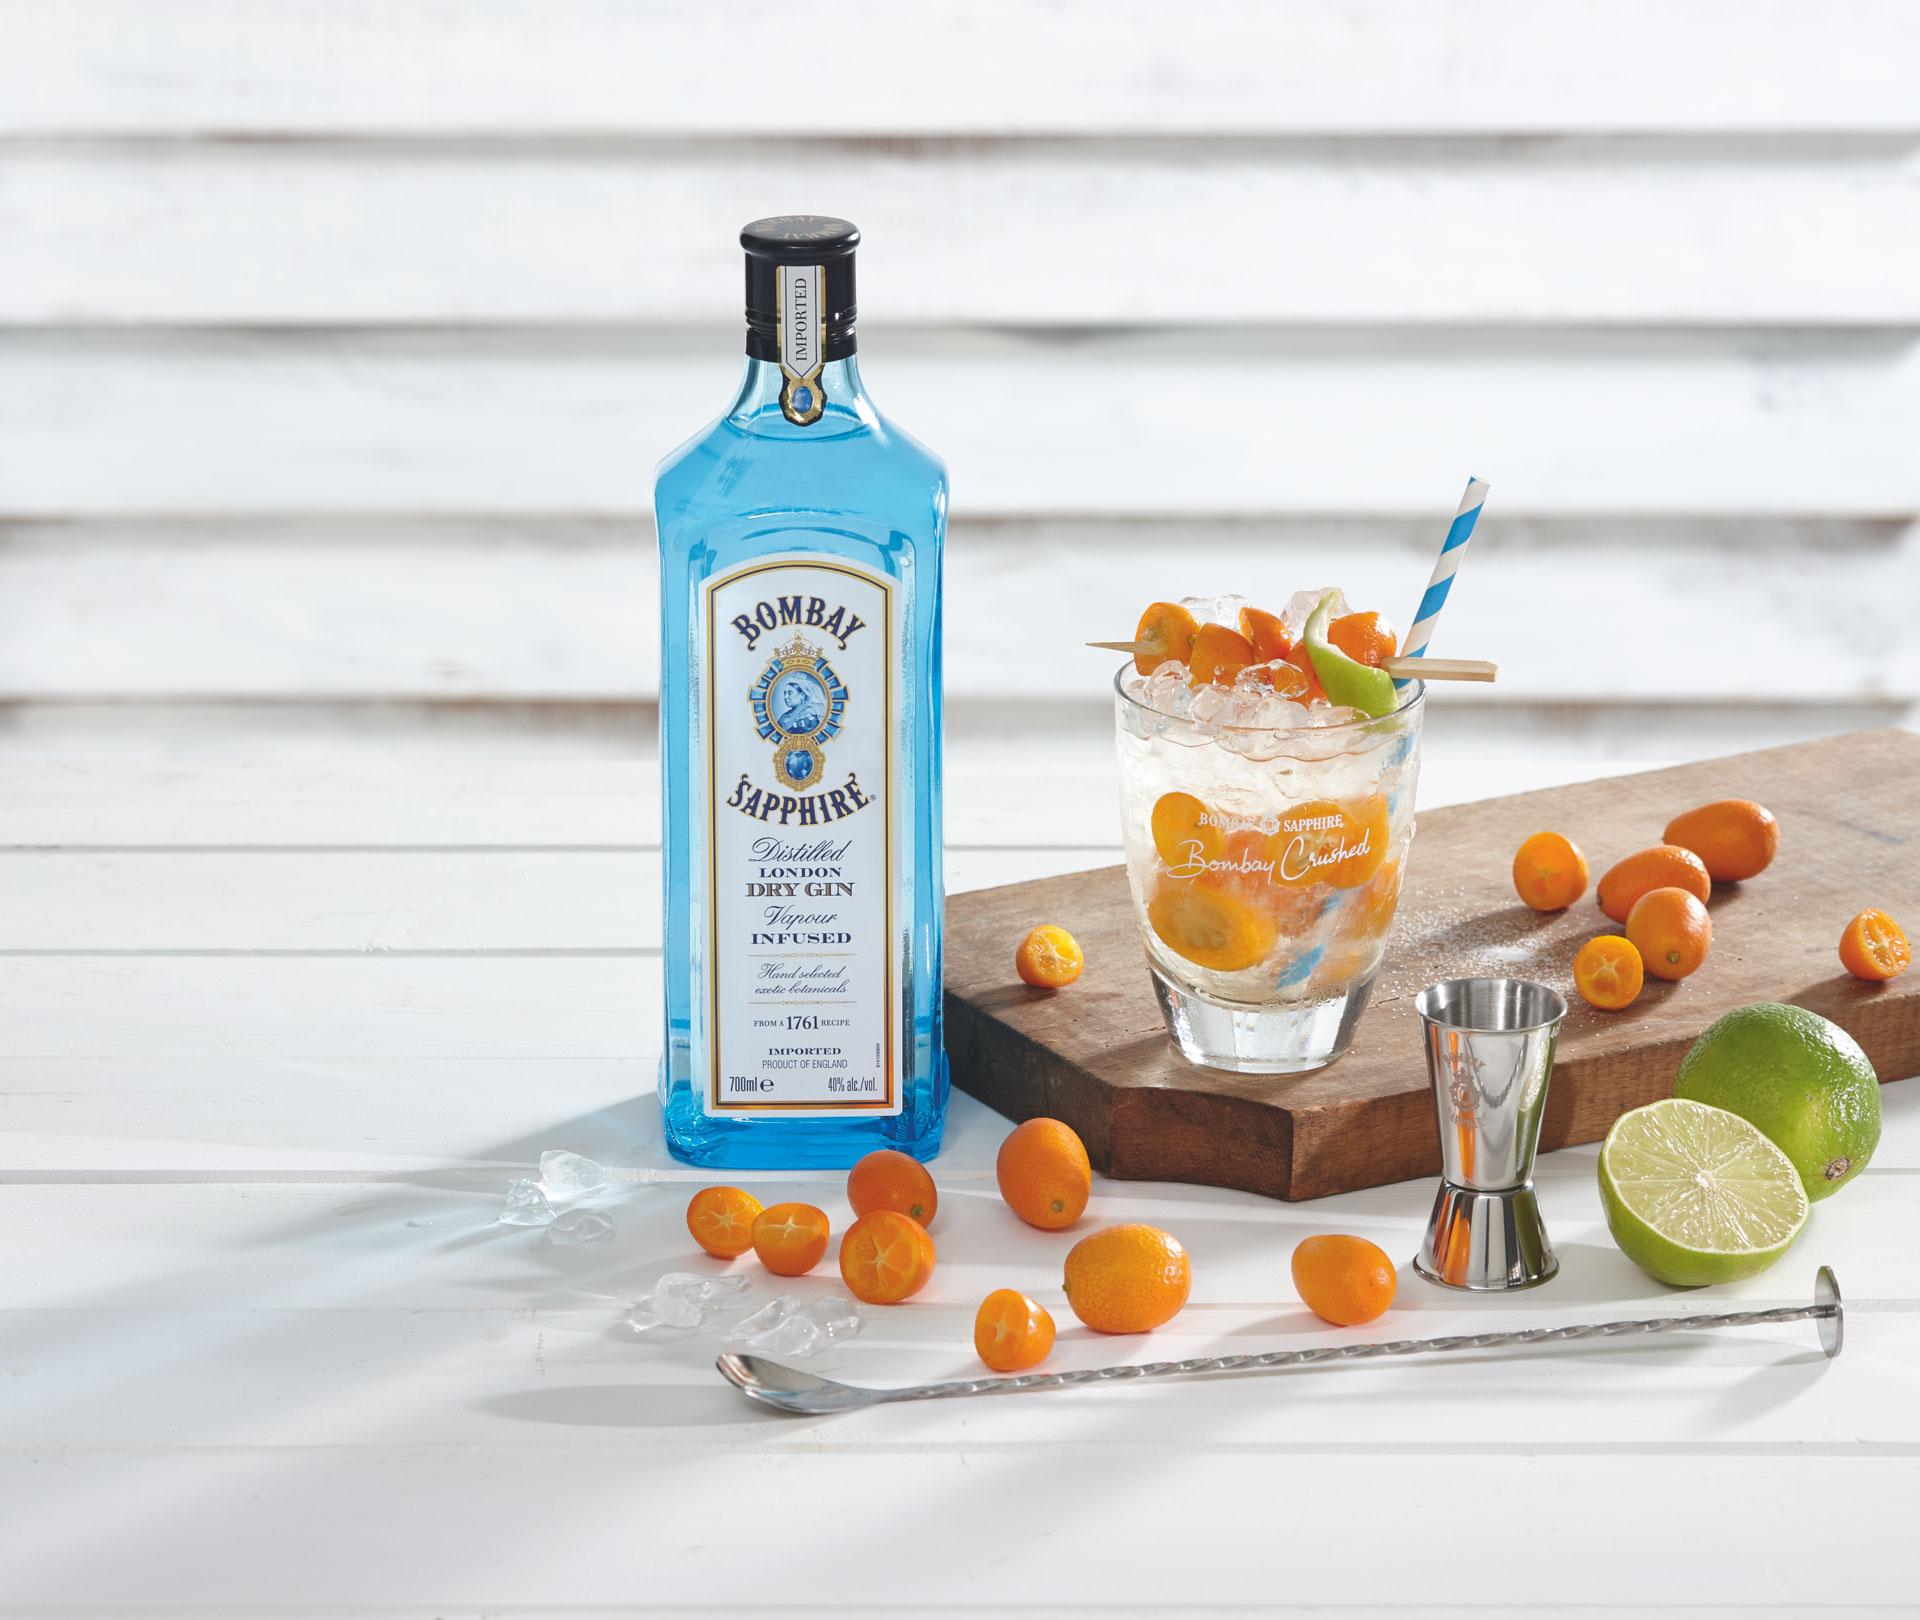 Bombay Sapphire Schuber Geschenkset - London Dry Gin 0,7l 700ml (40% Vol) + 2x Stirrer + 2er Set Ballon Glas